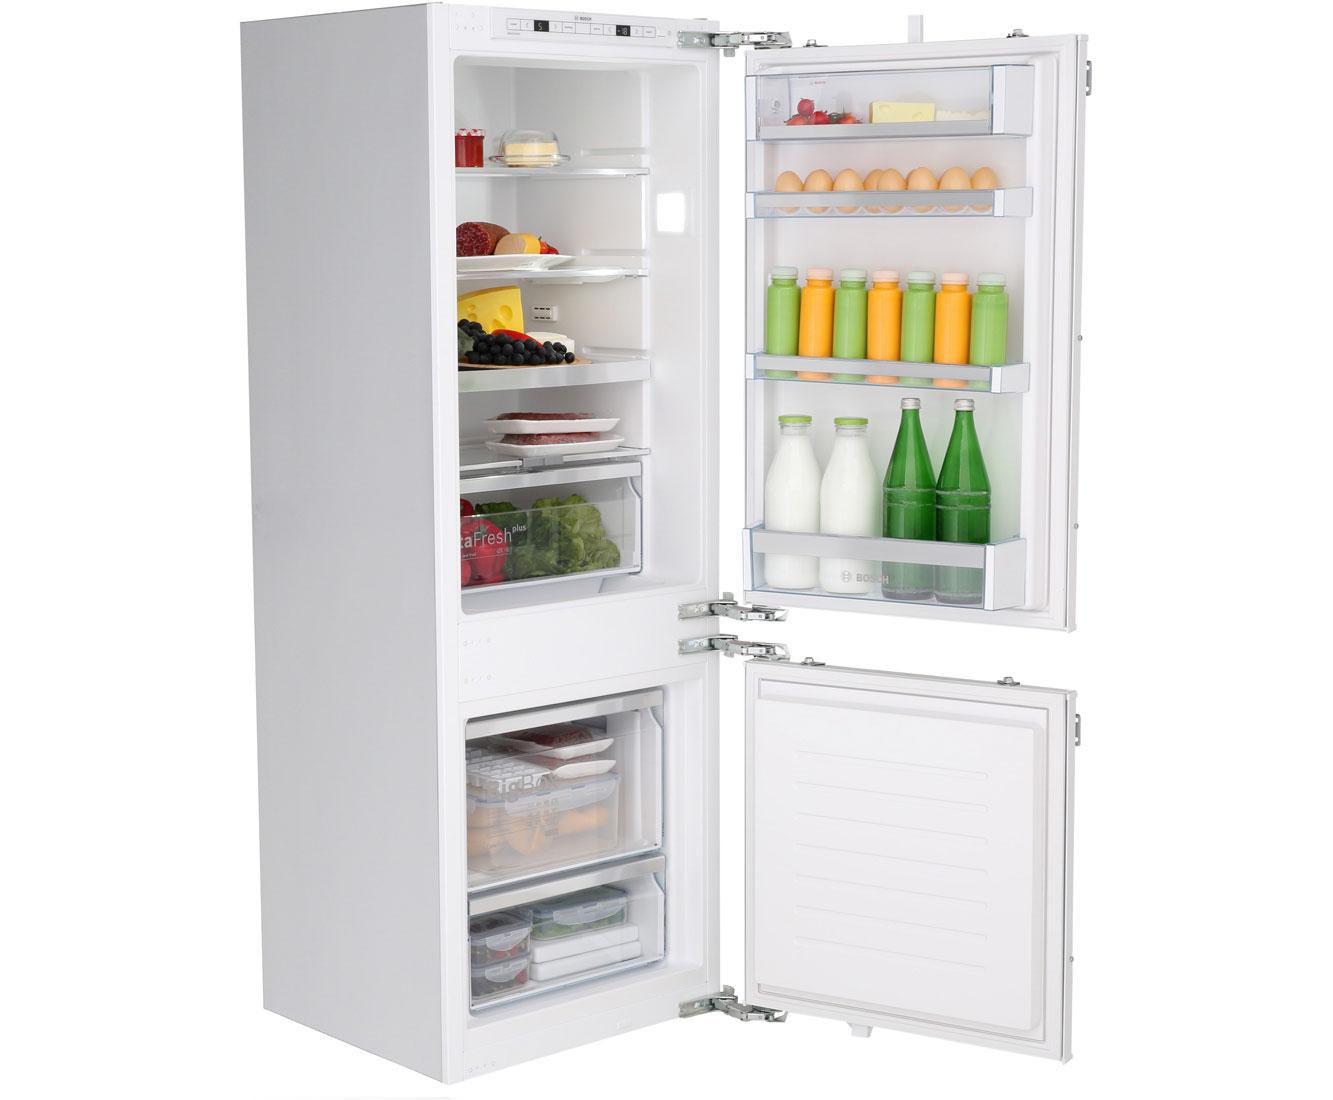 Aeg Kühlschrank Pro Fresh : Aeg kühlschrank gefrierkombination einbau: aeg kühl